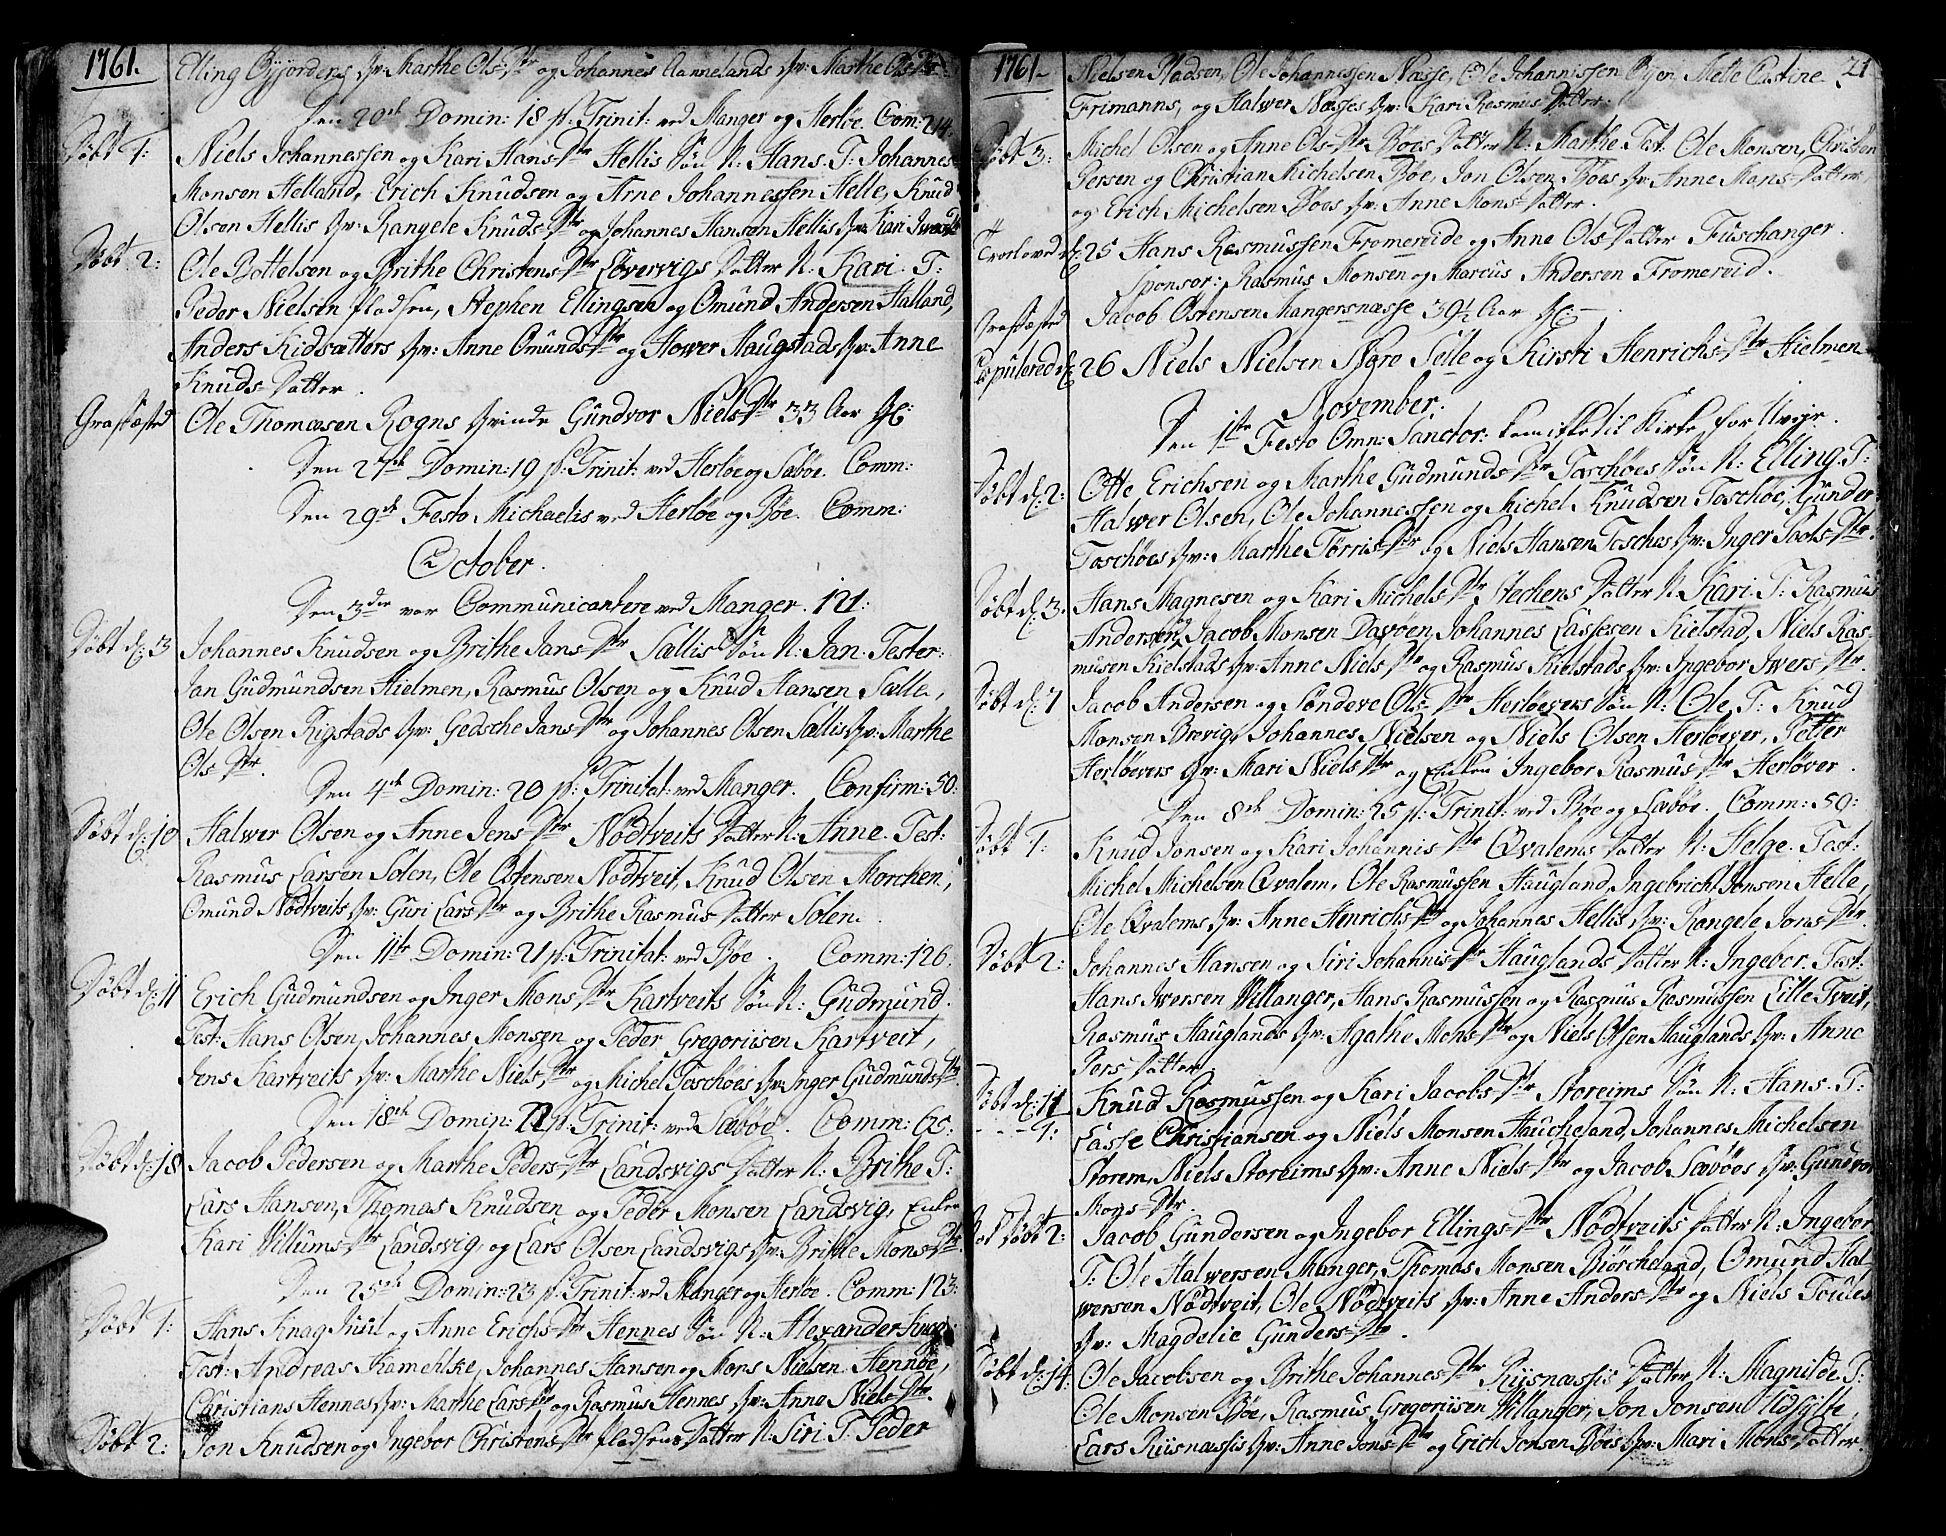 SAB, Manger sokneprestembete, H/Haa: Ministerialbok nr. A 1, 1759-1791, s. 21